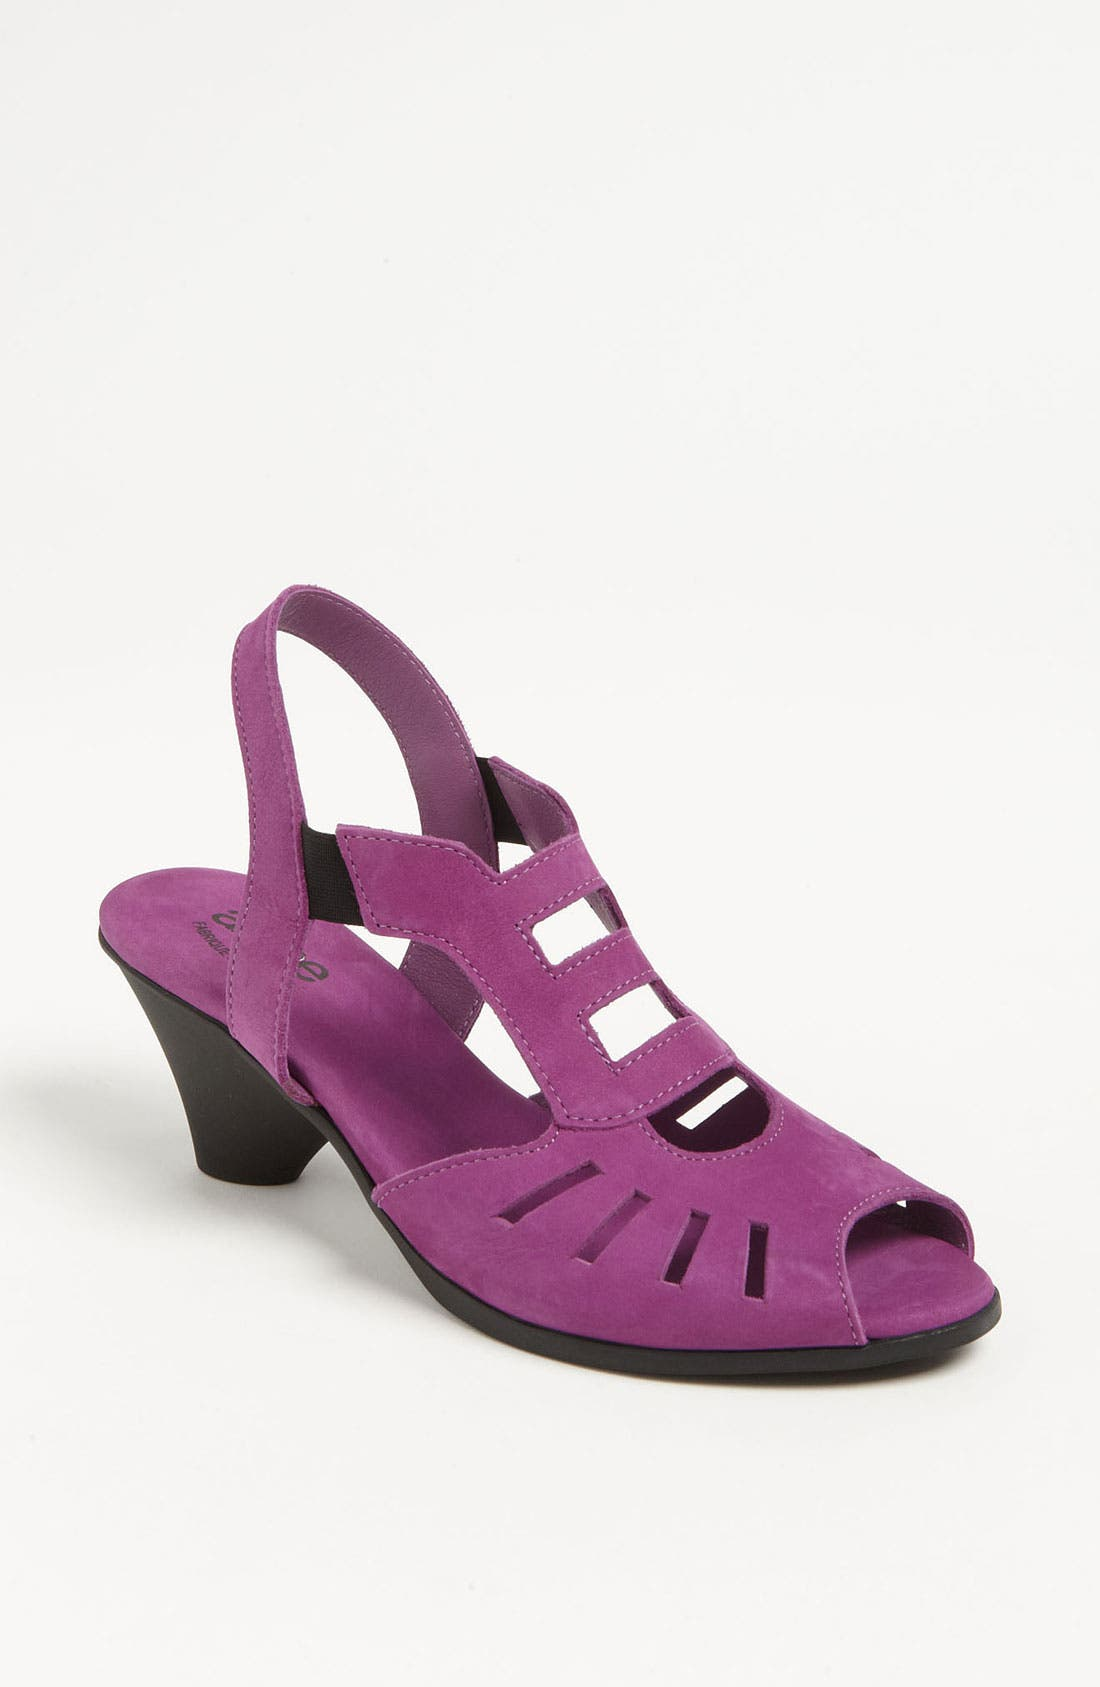 Main Image - Arche 'Exoko' Sandal